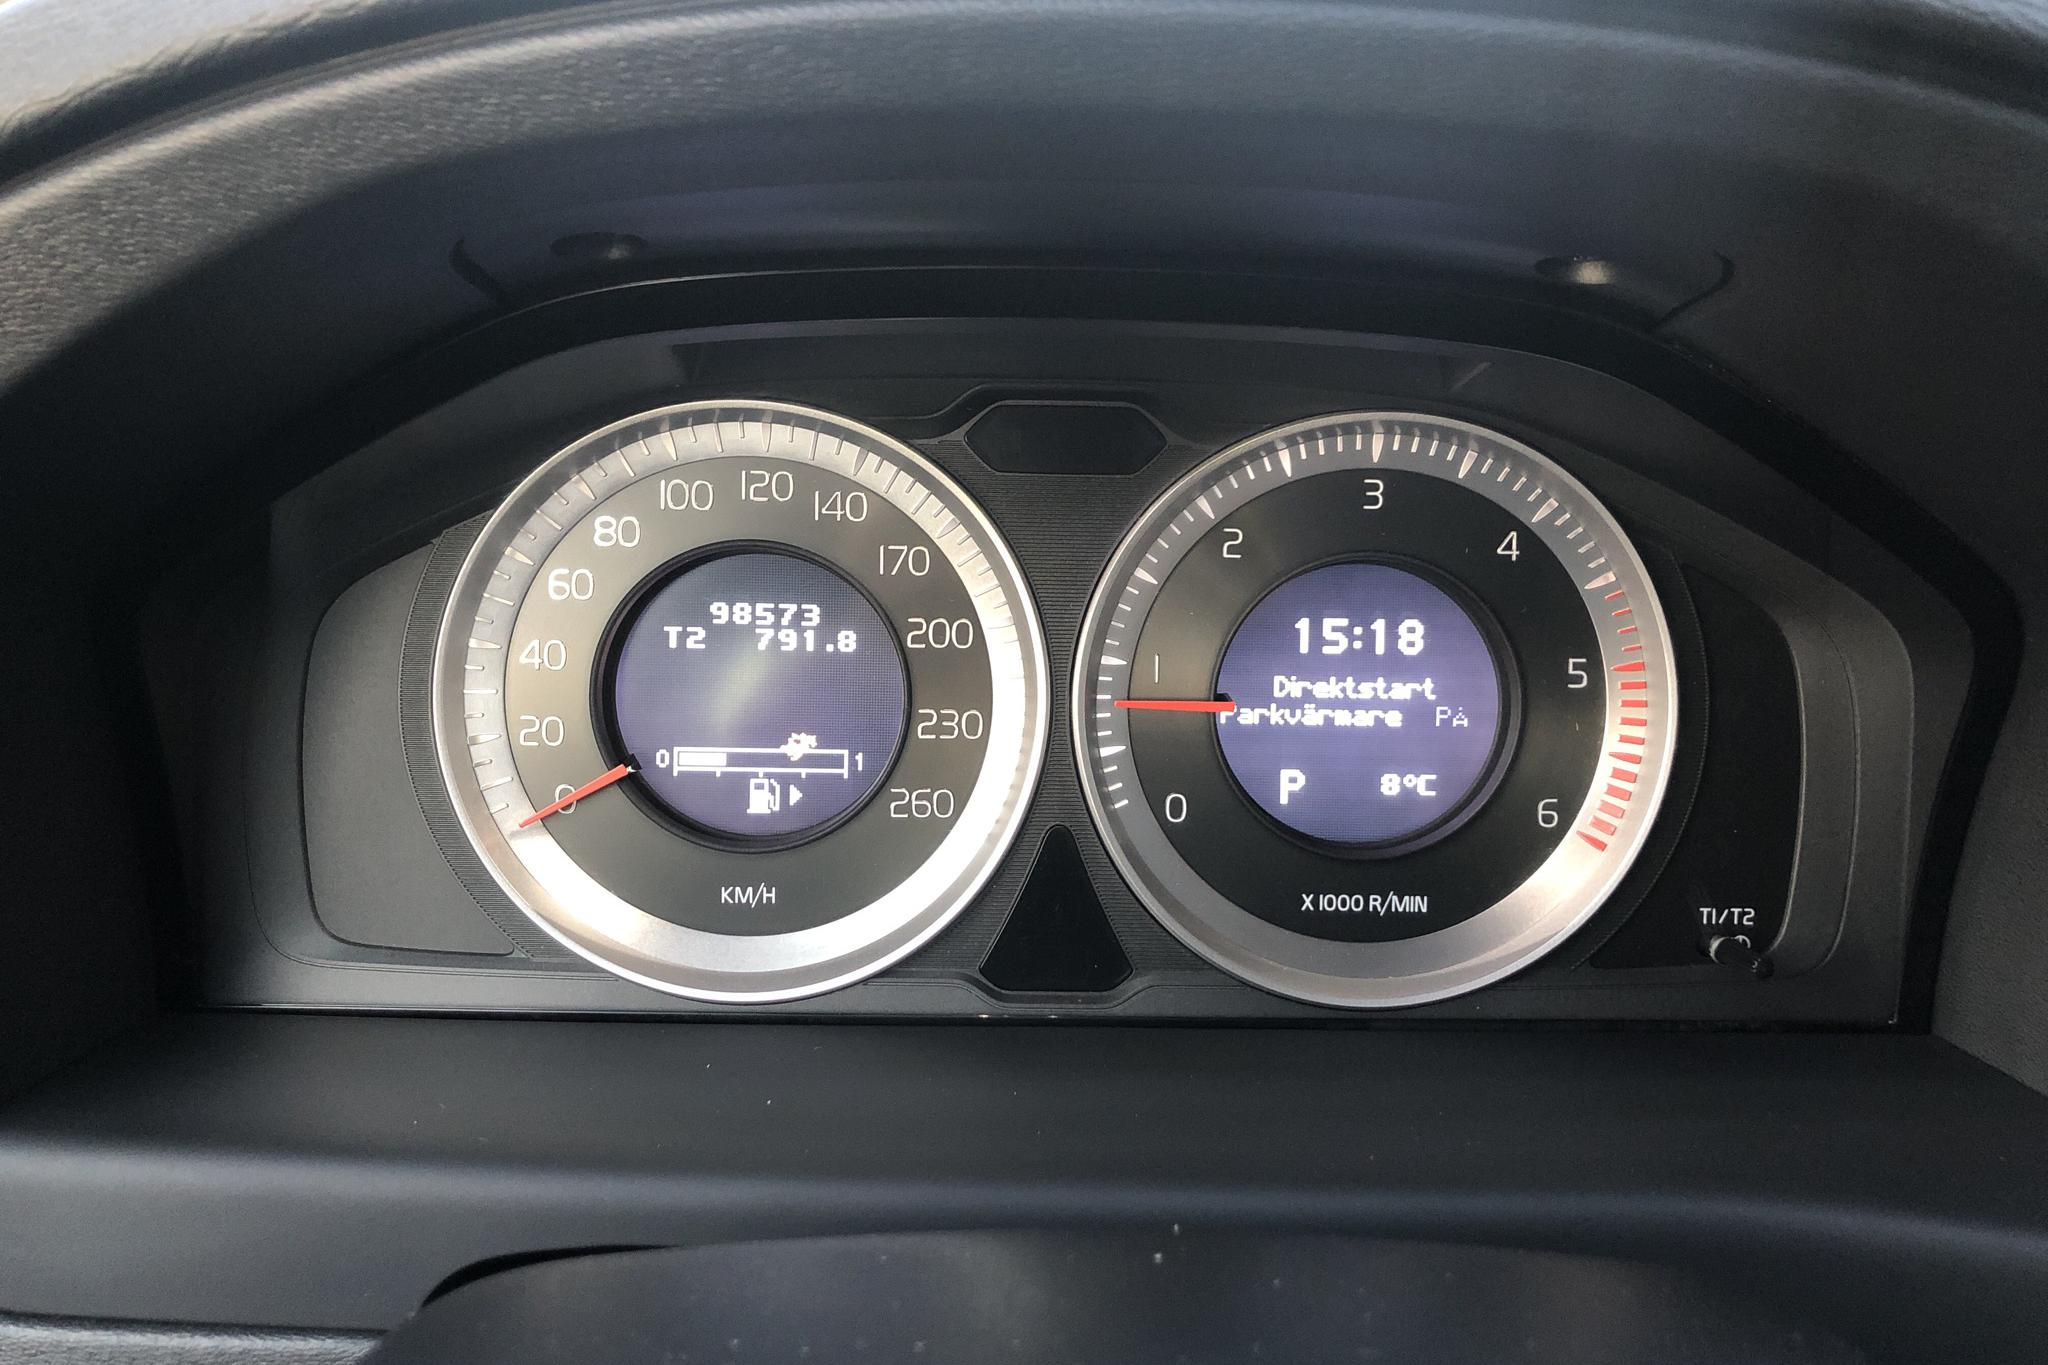 Volvo V70 II D3 (163hk) - 98 570 km - Automatic - Light Brown - 2011